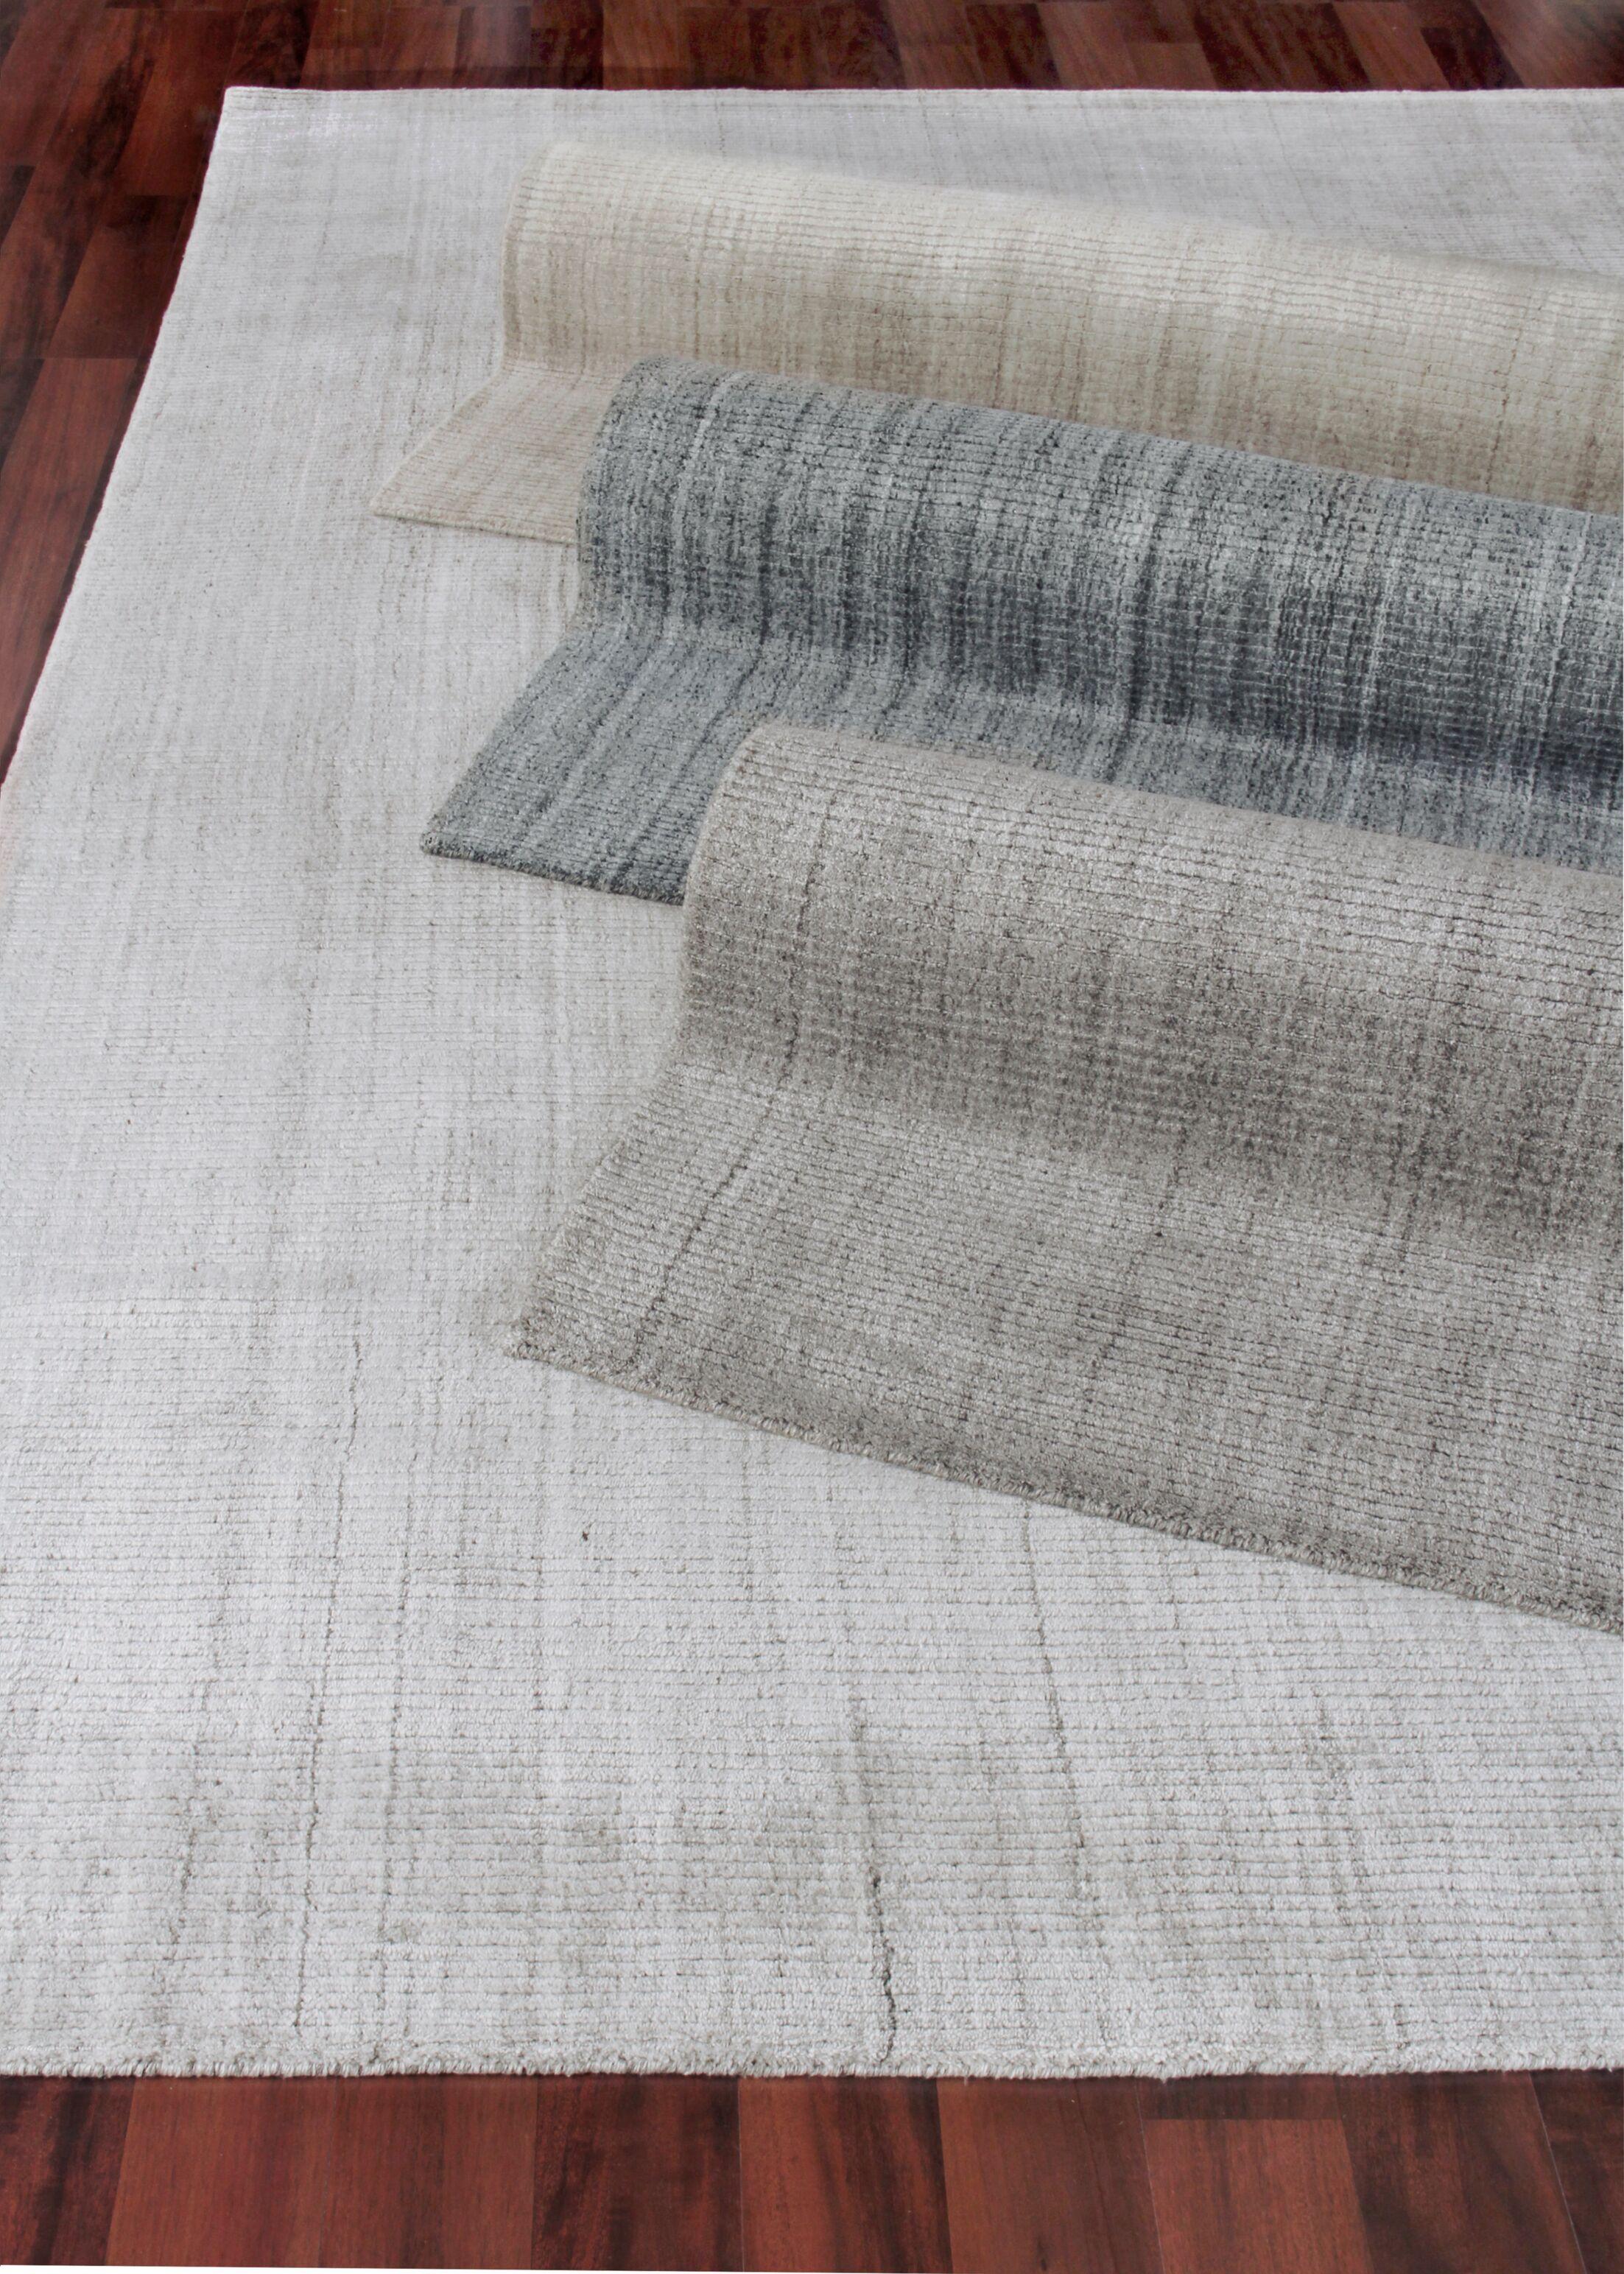 Robin Hand-Woven Light Beige Area Rug Rug Size: Rectangle 6' x 9'